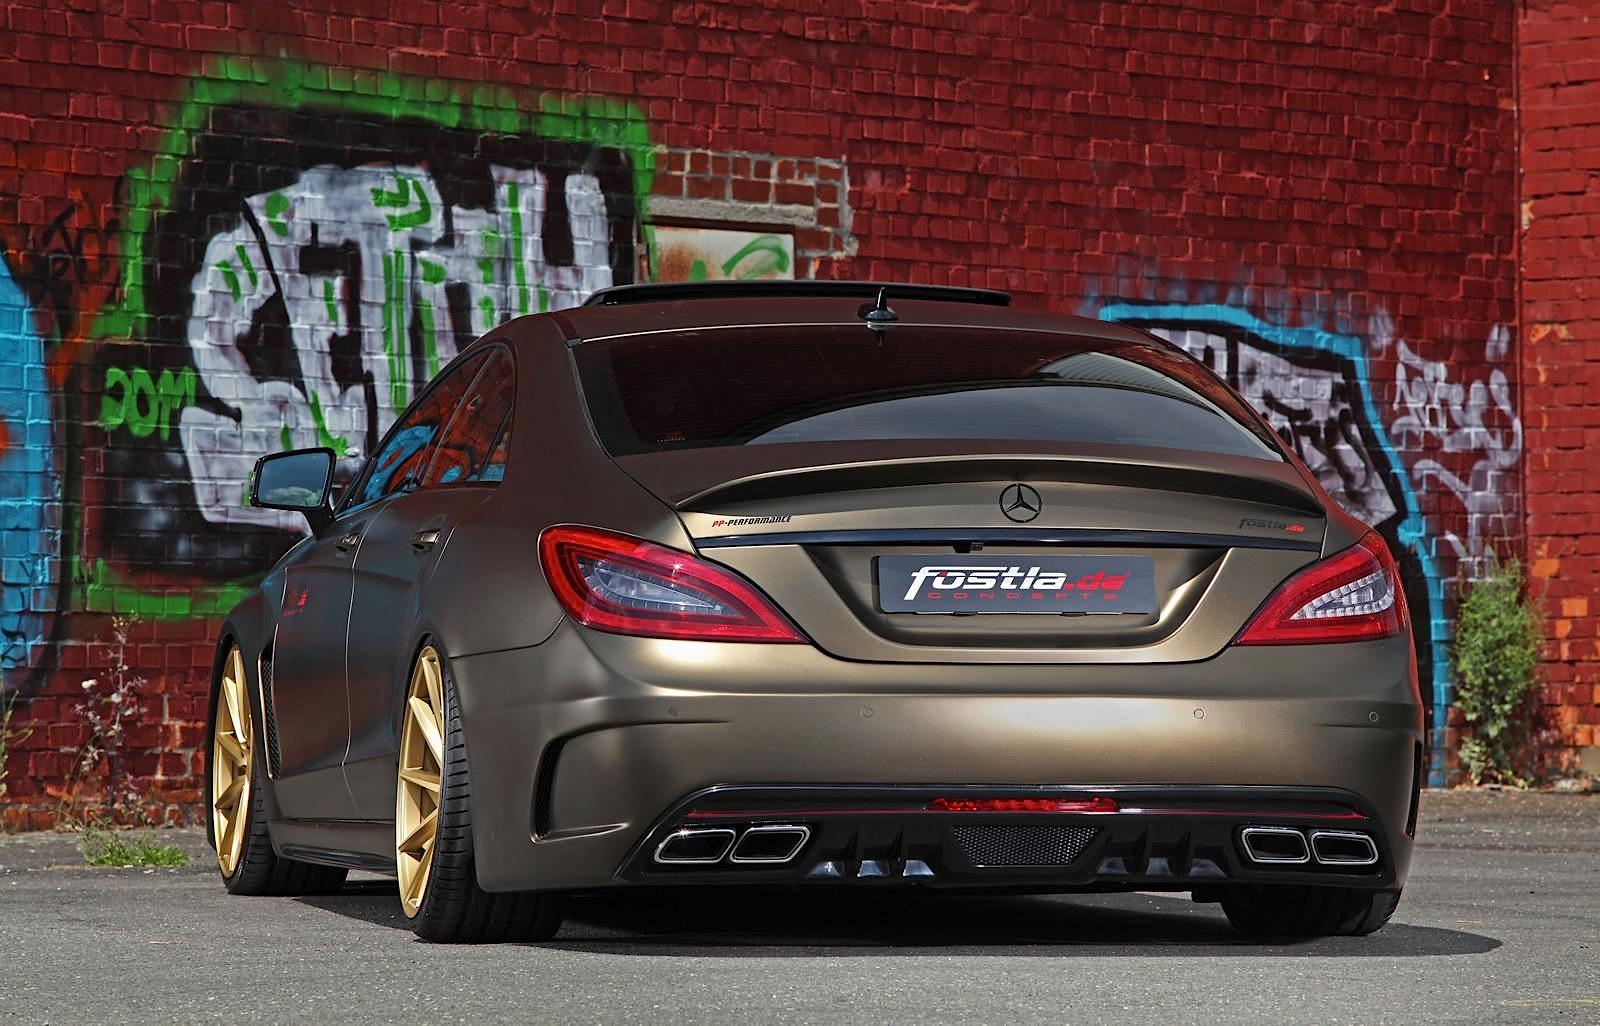 Slammed Mercedes Benz Cls 350 Cdi By Fostla Performancedrive